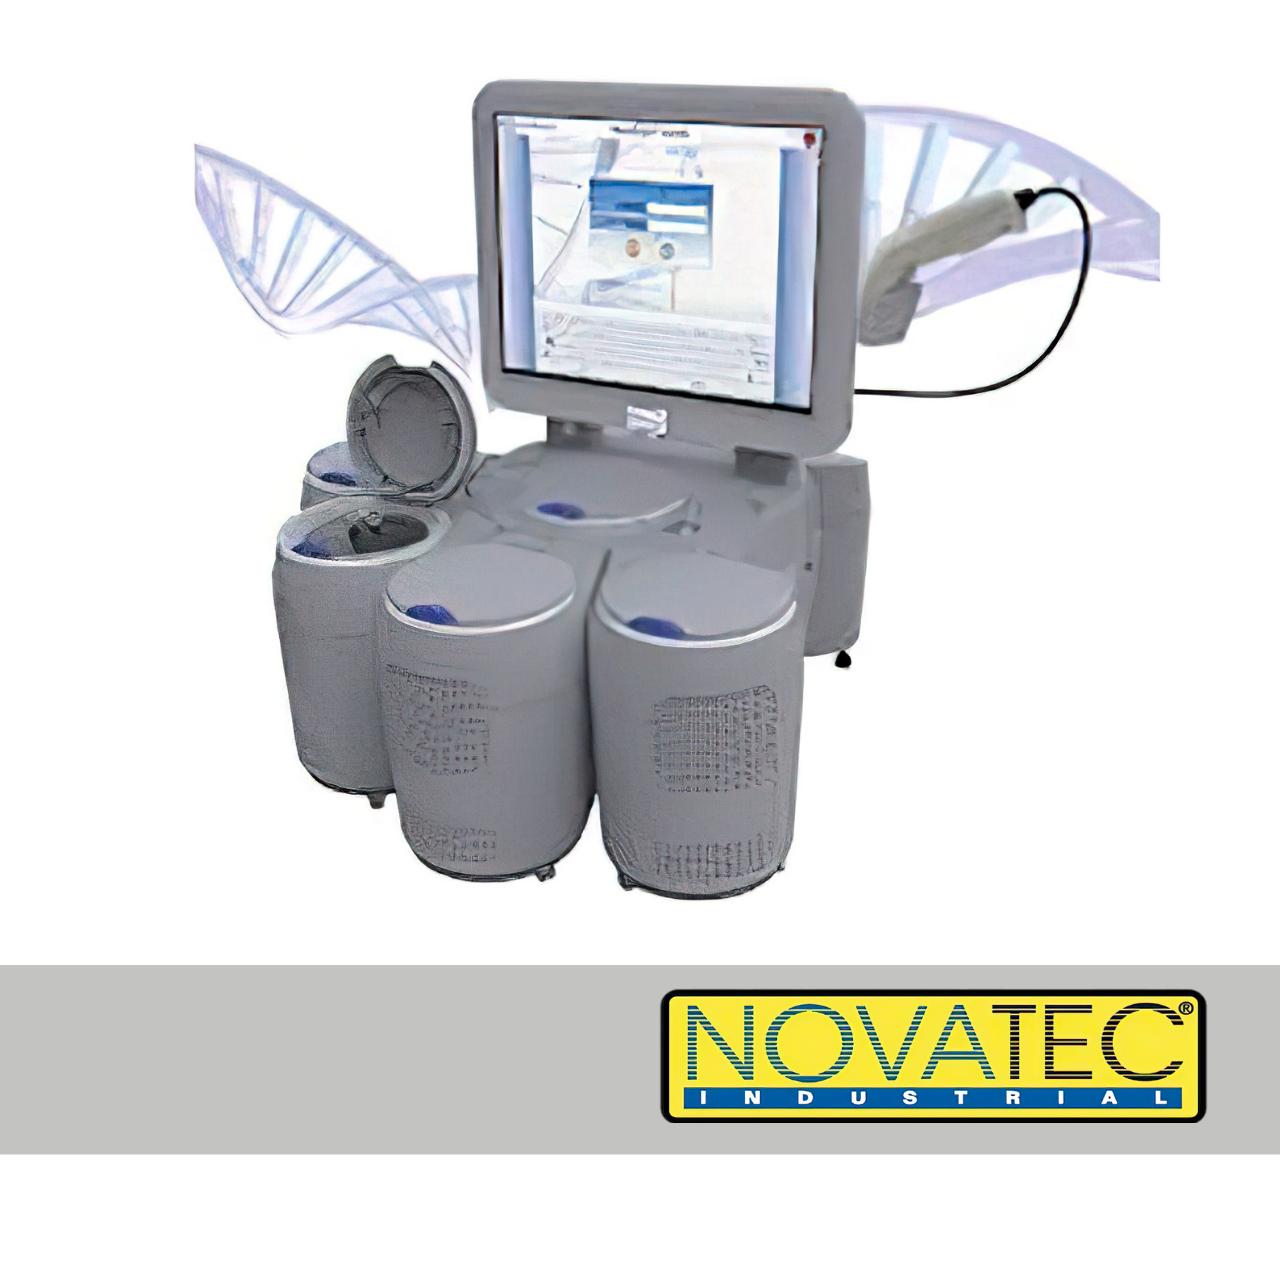 PALL Genedisc - PCR